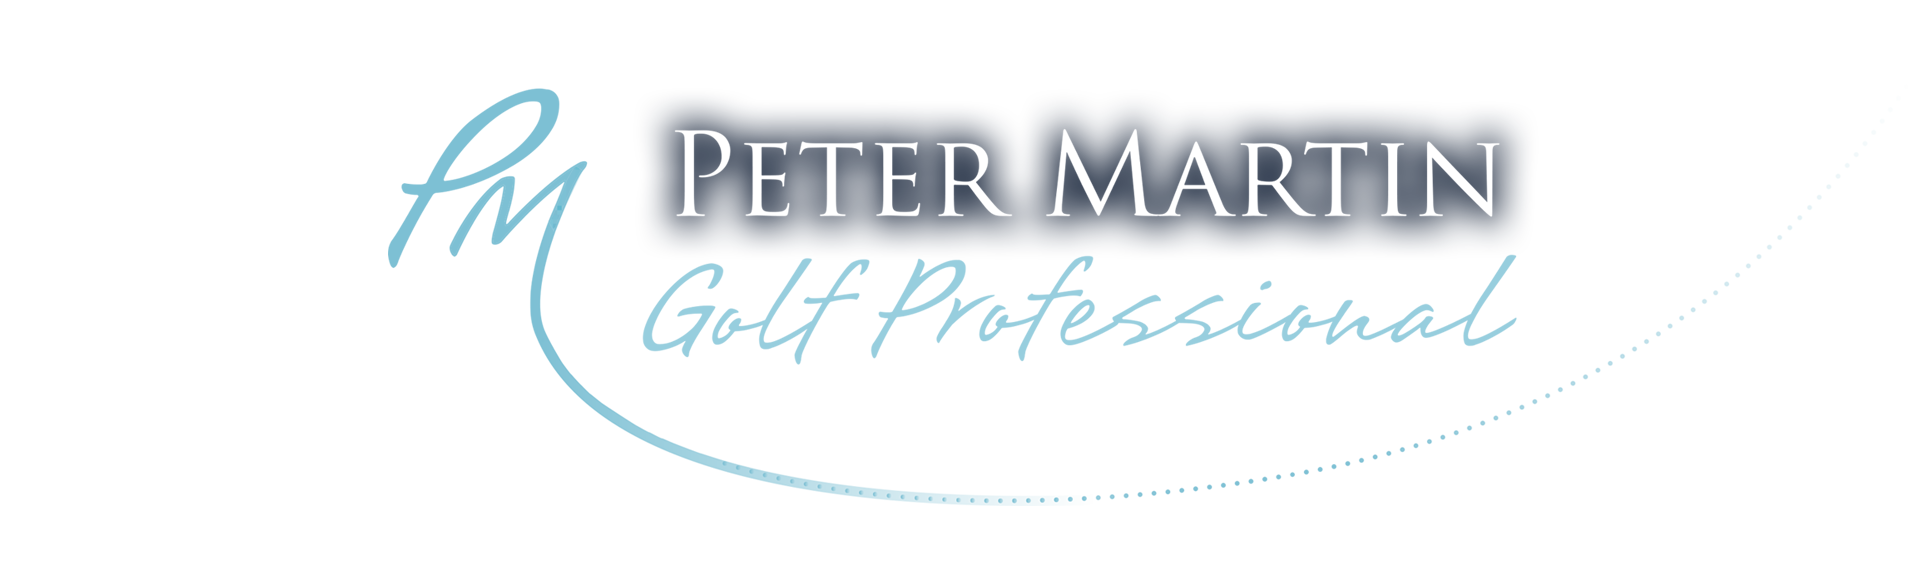 achievements peter martin golf professional peter martin golf professional